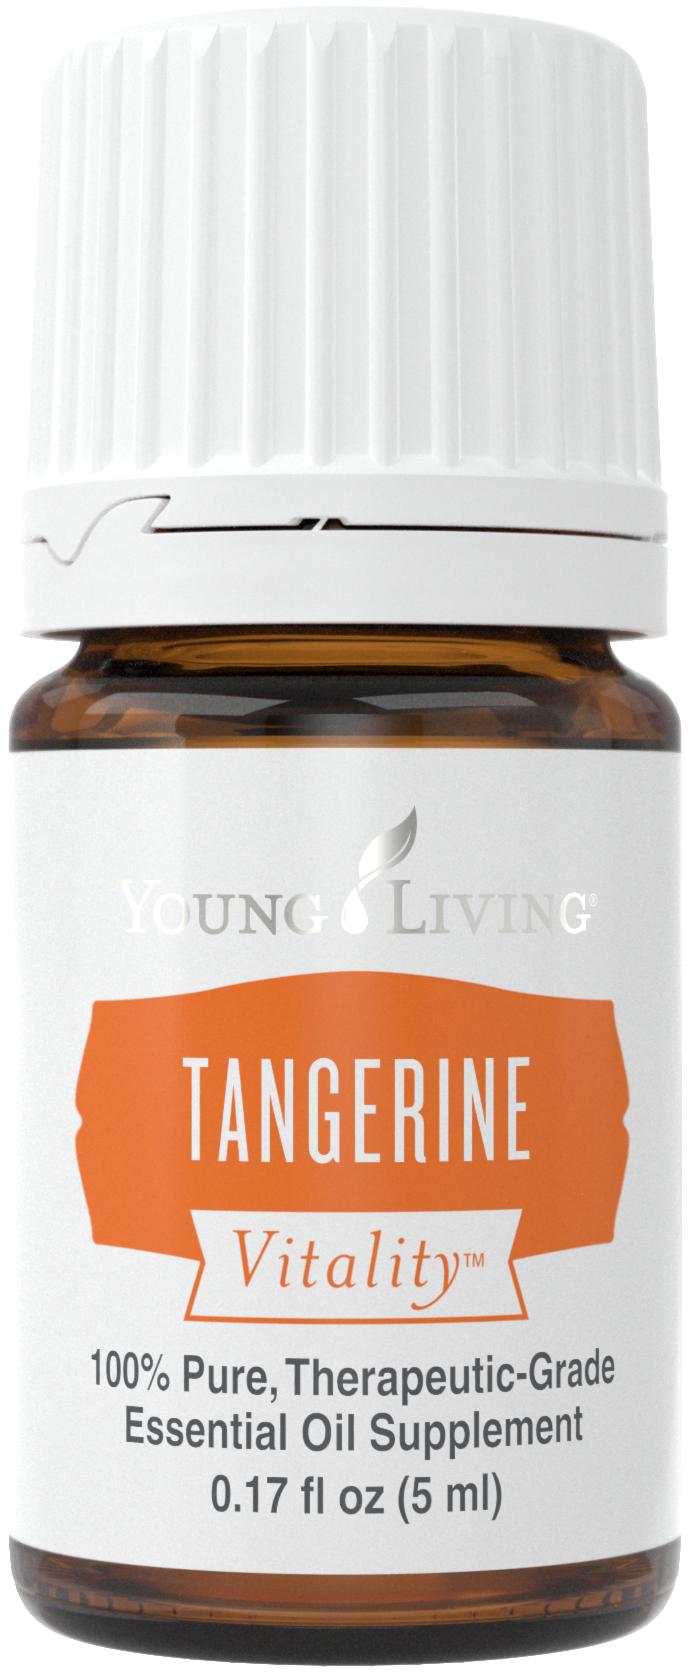 tangerine_5ml_suplement_silo_2016_23775651483_o